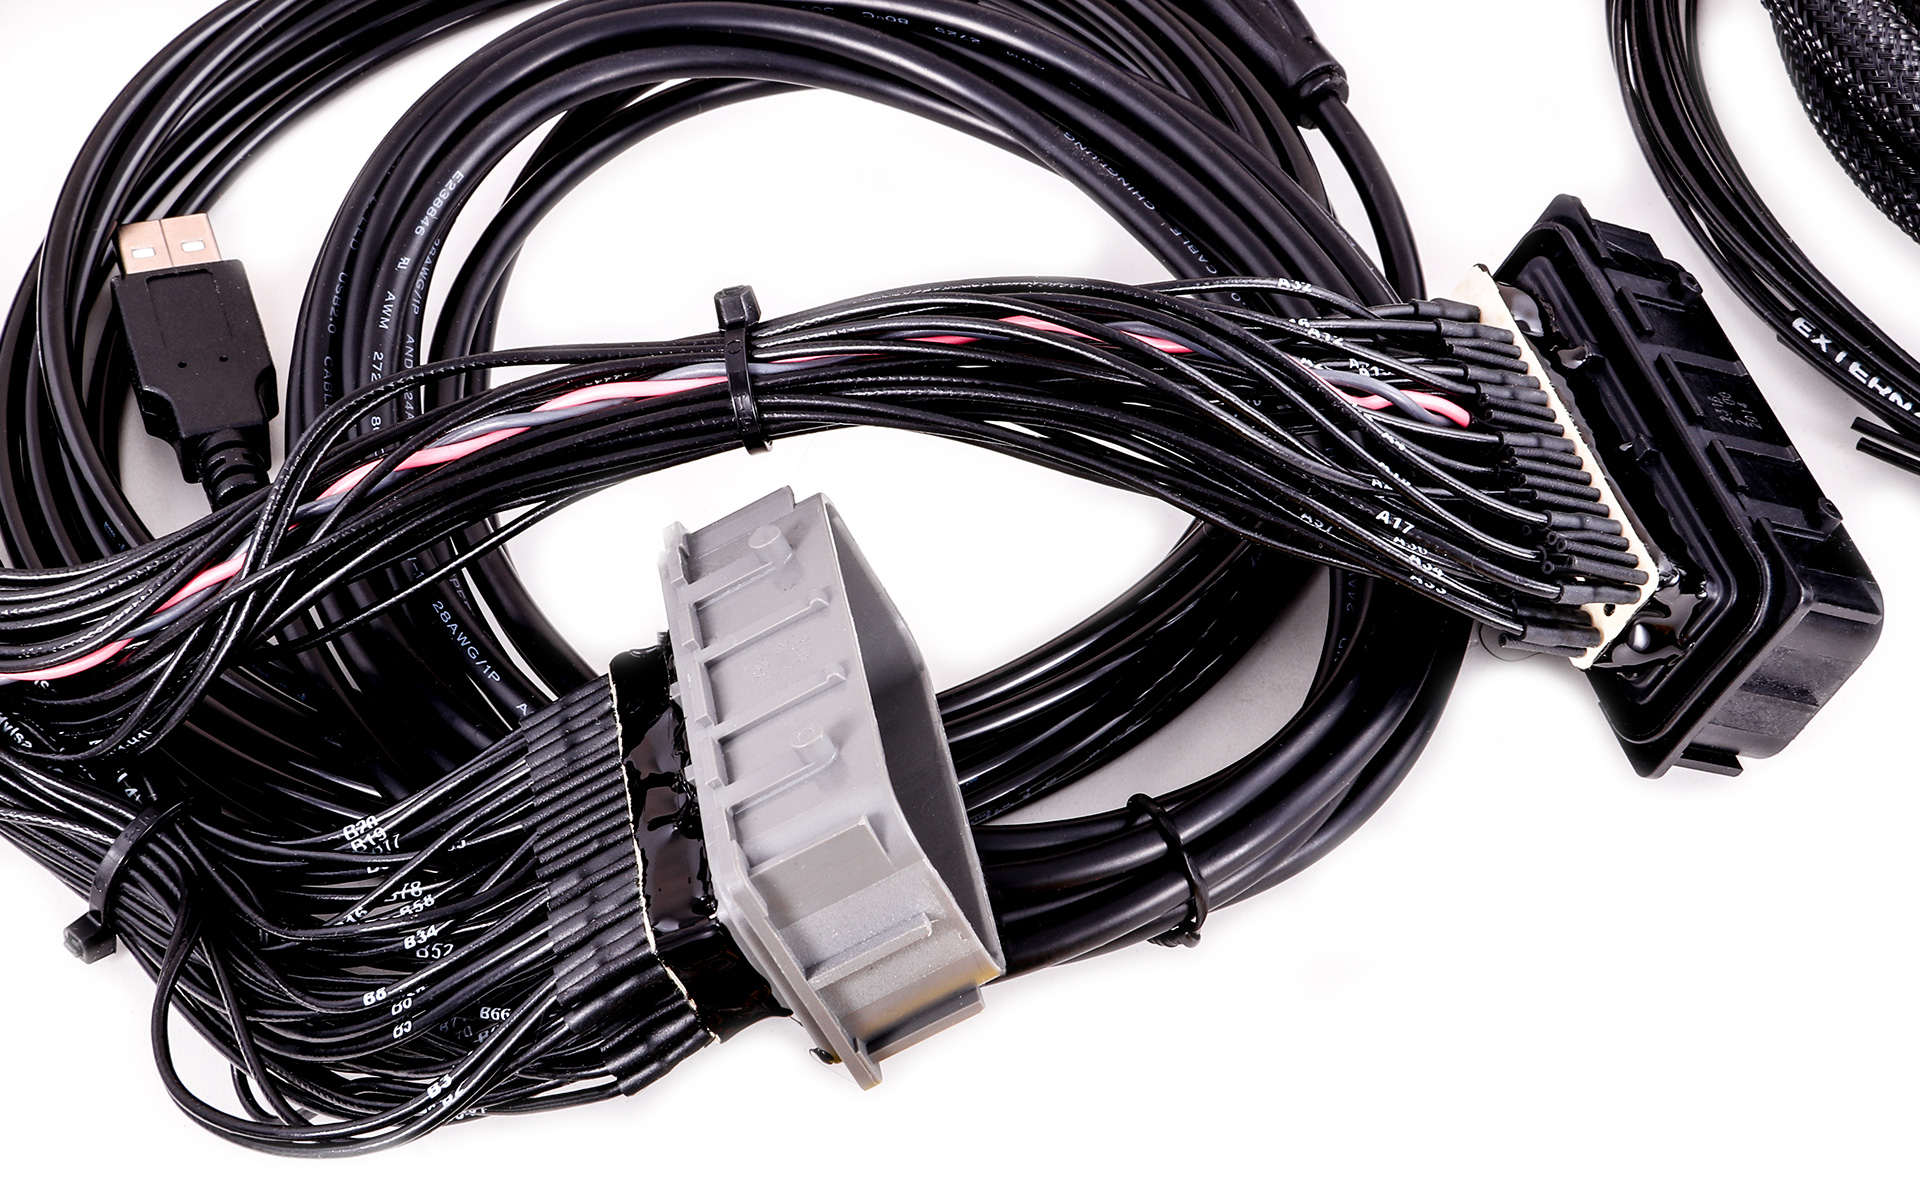 Maxxecu Pro Plugin Ecu For Corvette C6 Wire Harness E38 Ecm Connectors